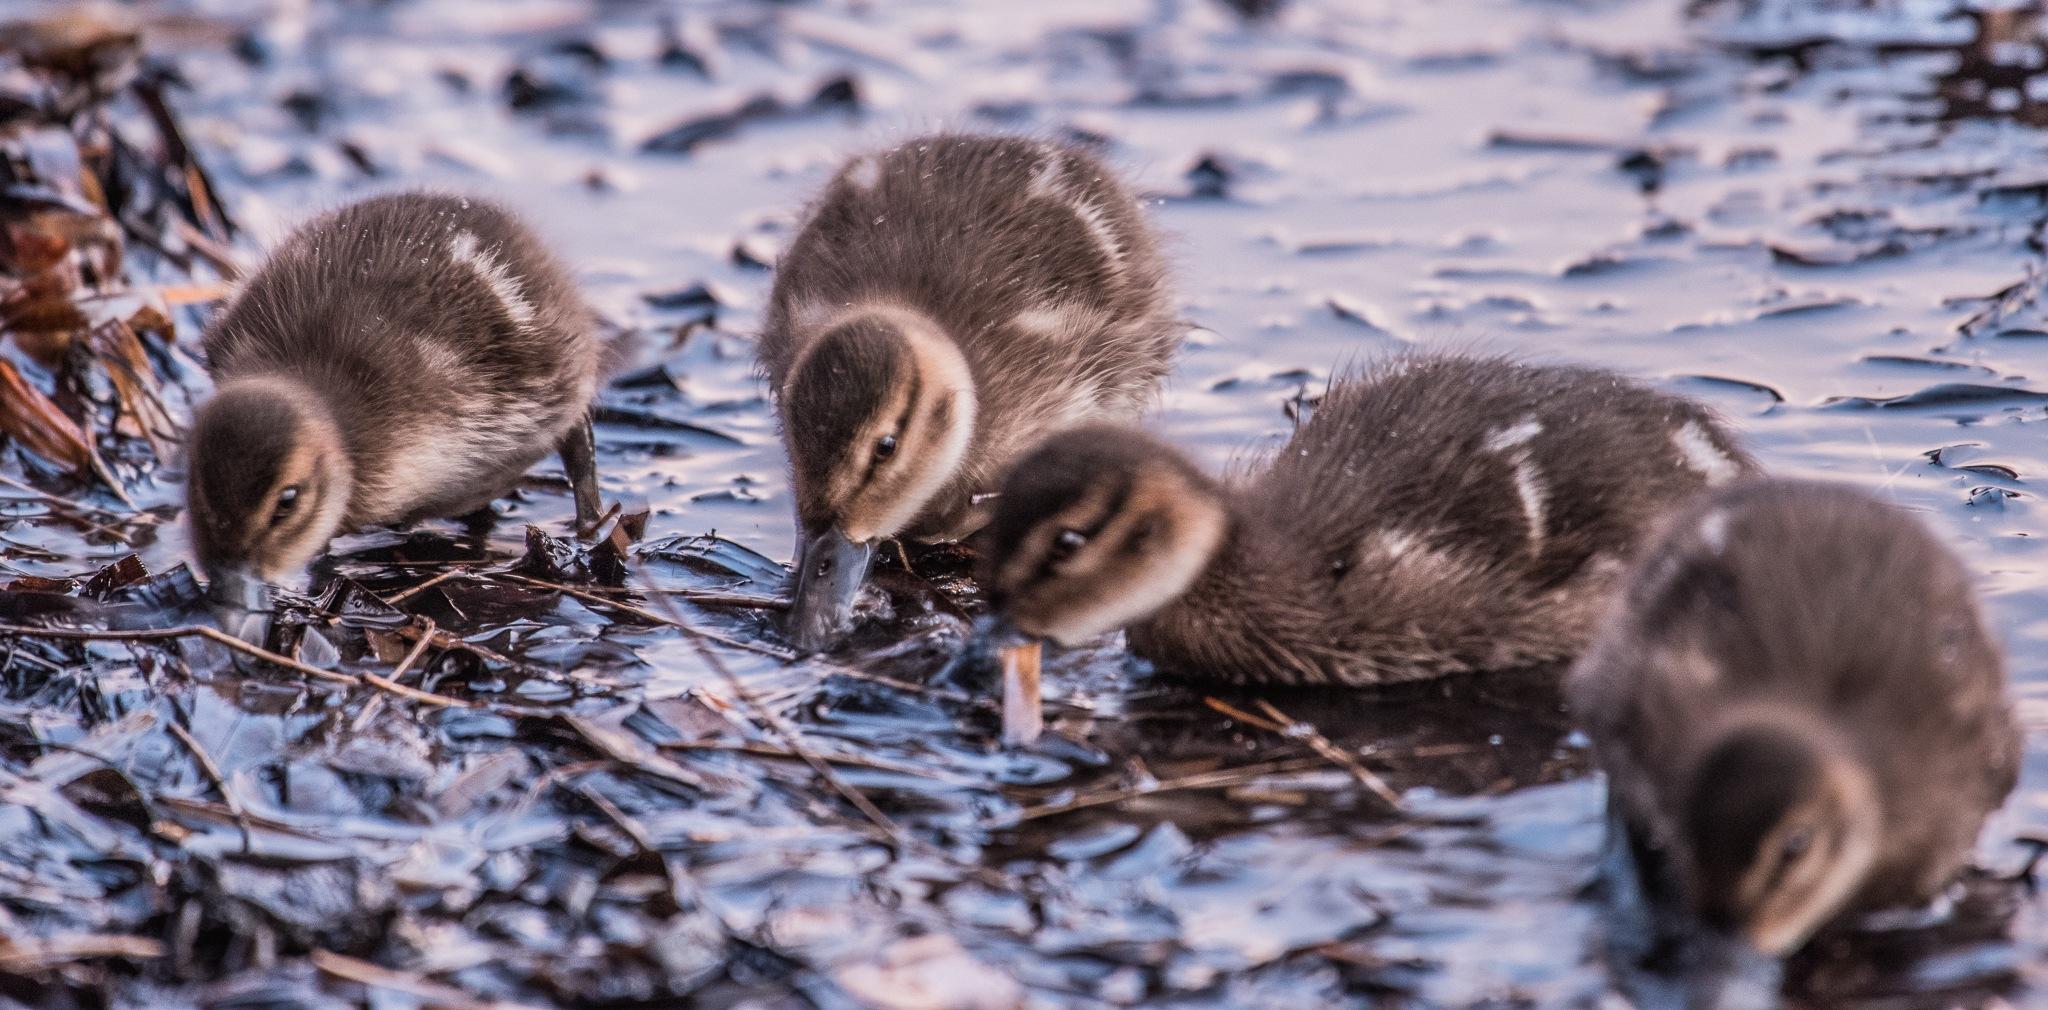 A day for Ducks 2 by Trevor McKinnon